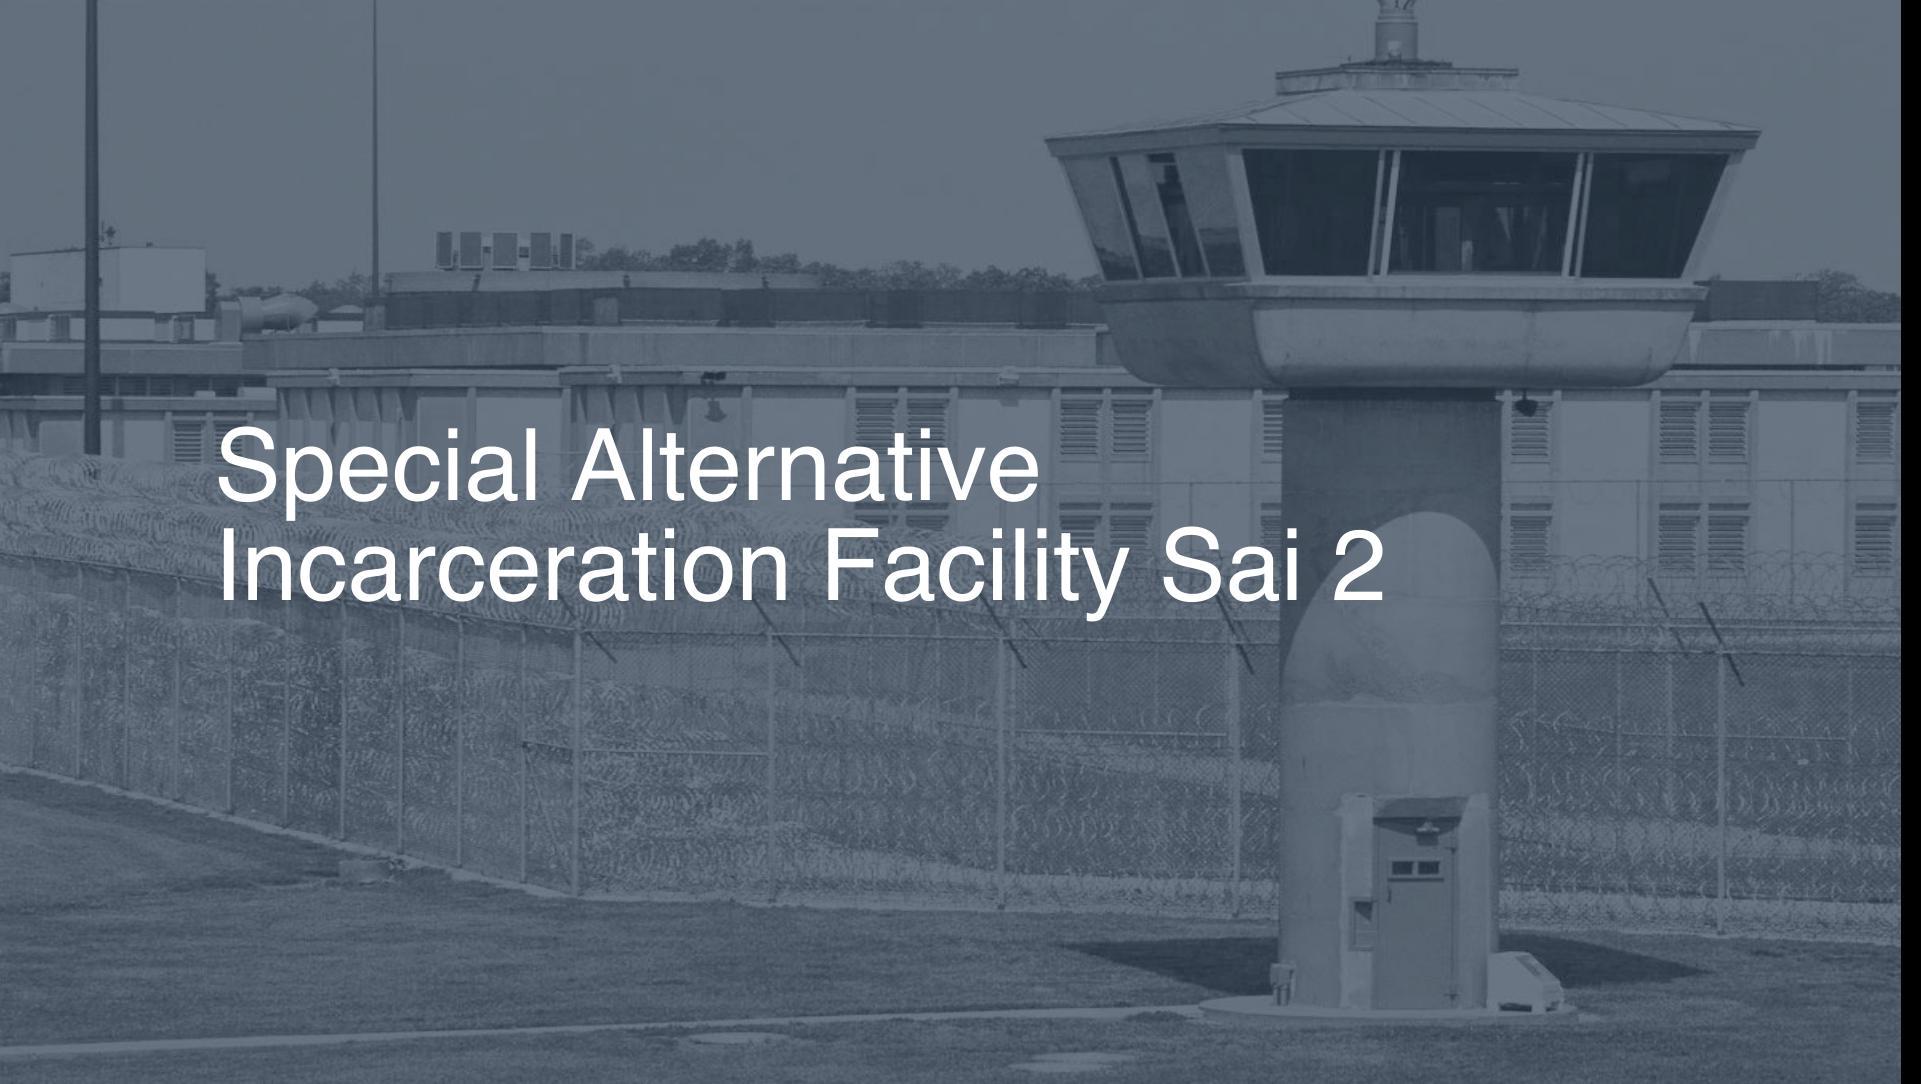 Special Alternative Incarceration Facility (SAI) correctional facility picture